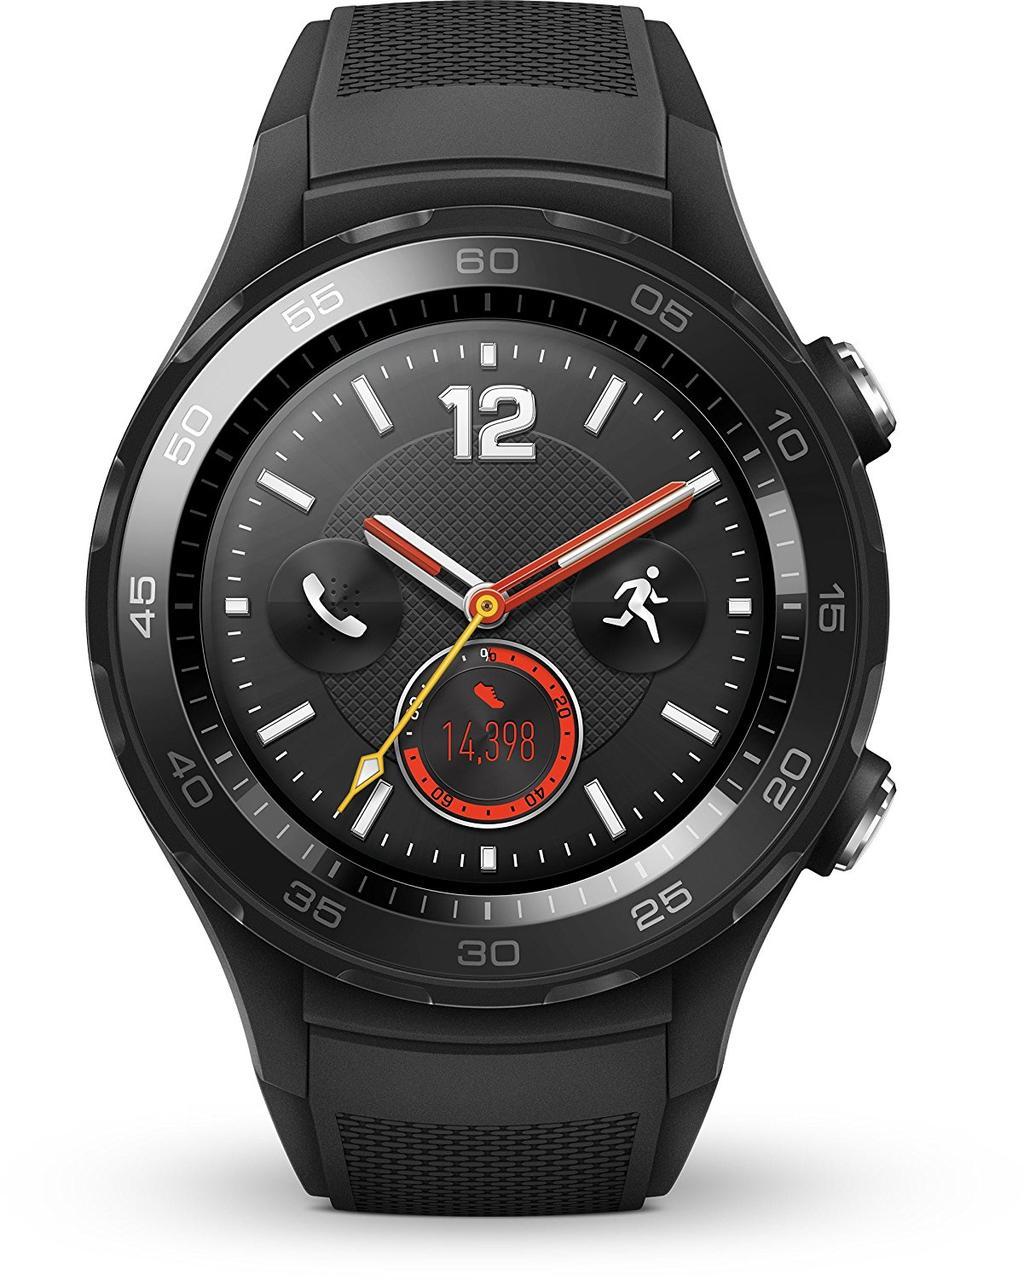 Huawei Watch 2 - Carbon Black (Поддержка SIM карт 3G/4G LTE)